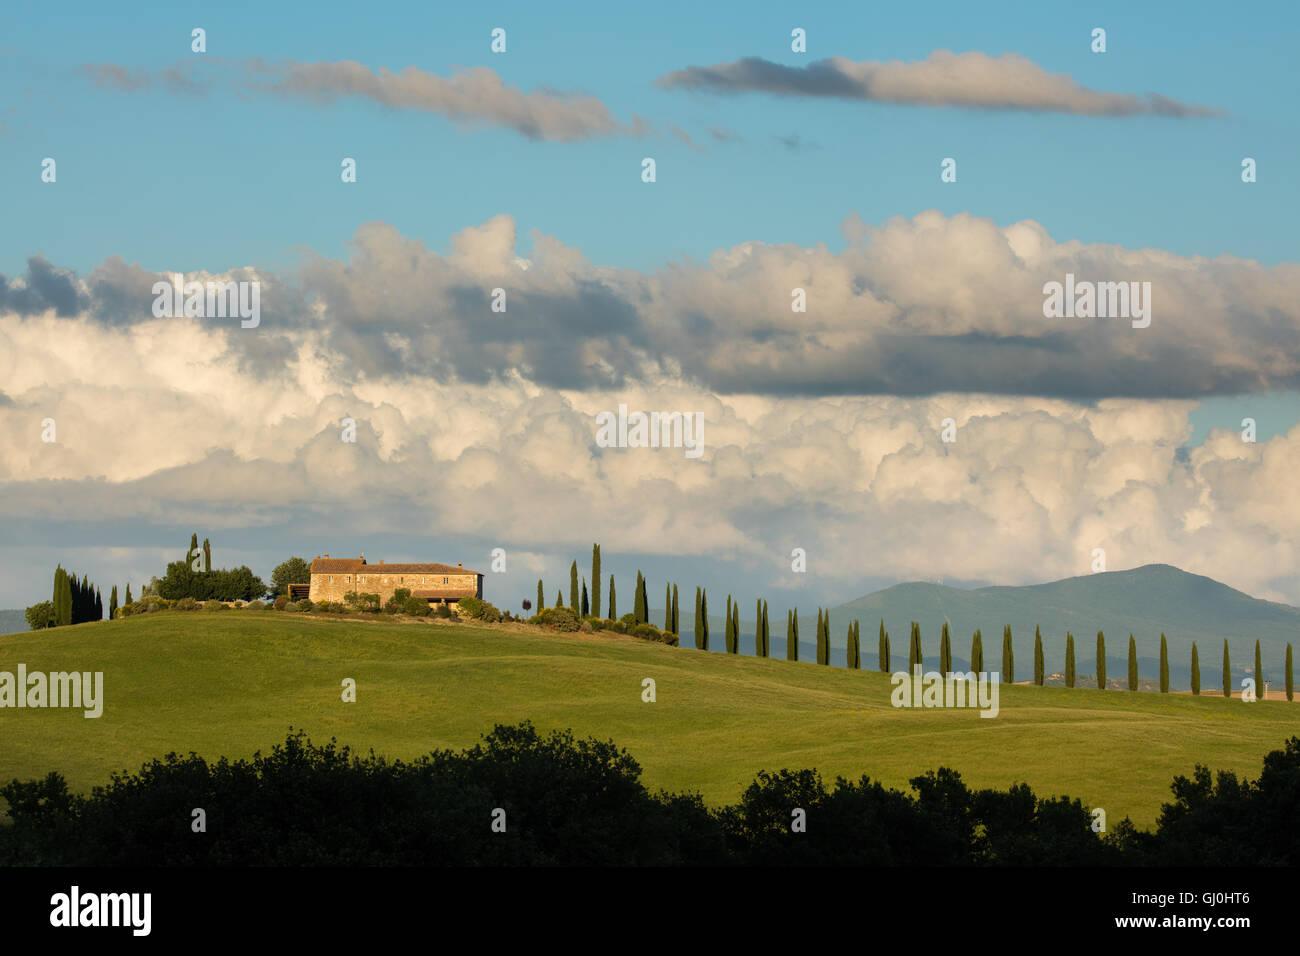 a villa and avenue of cyprus trees near Castiglione d'Orcia, Tuscany, Italy - Stock Image